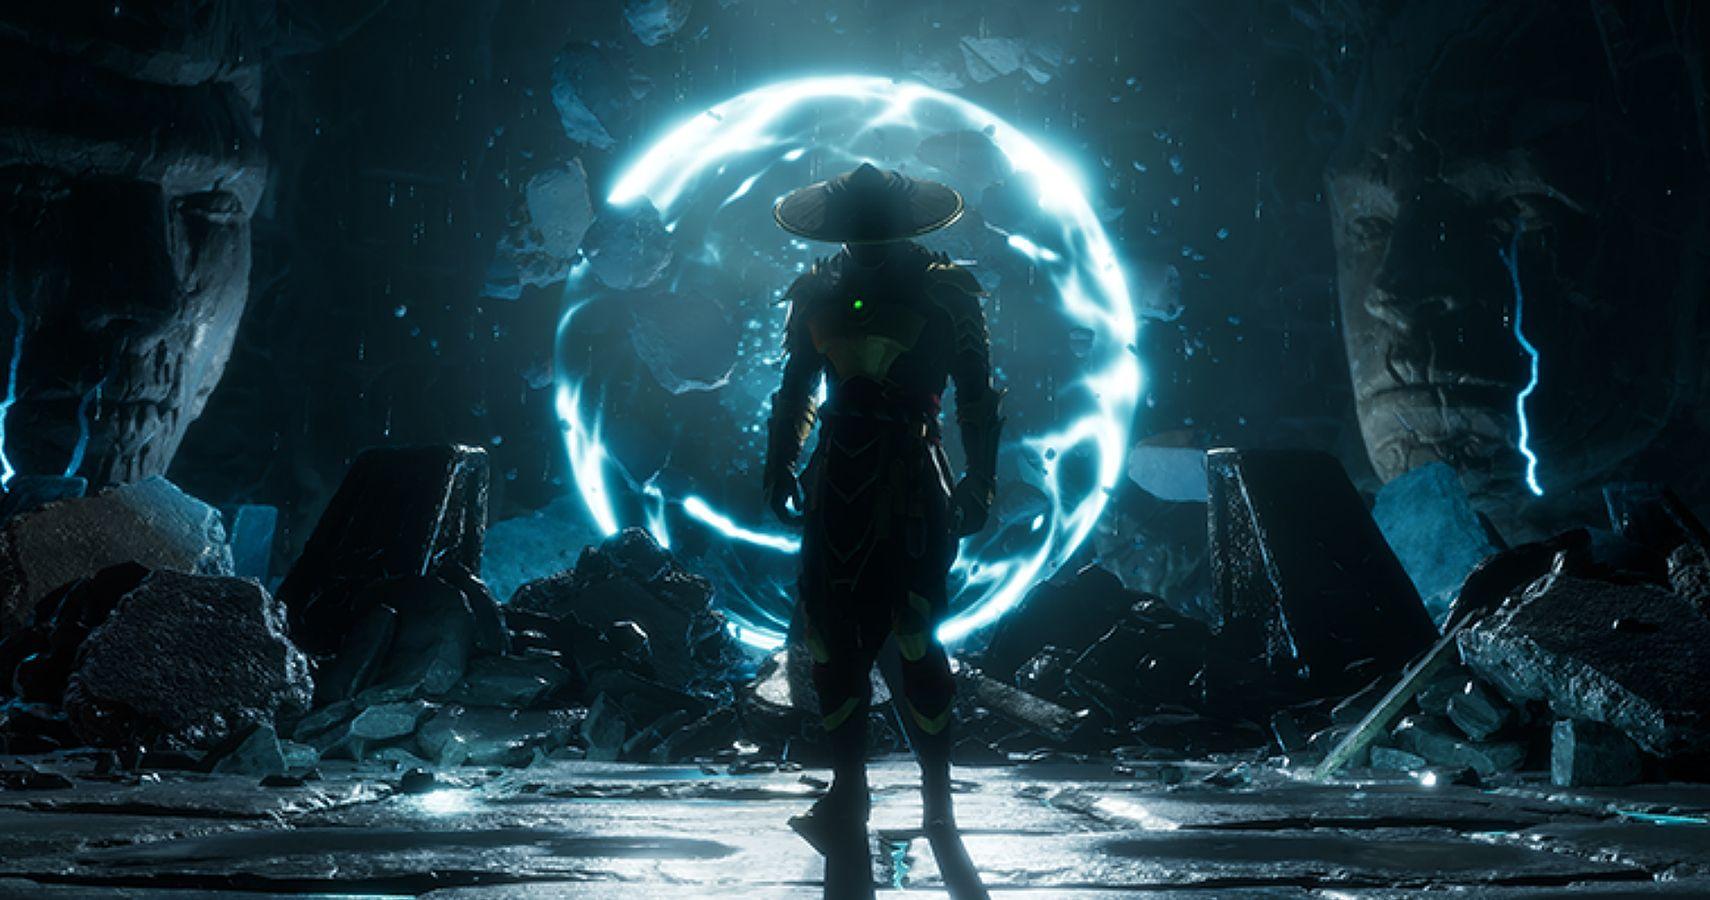 Mortal Kombat 11: The 10 Best Fighters For Beginners | TheGamer